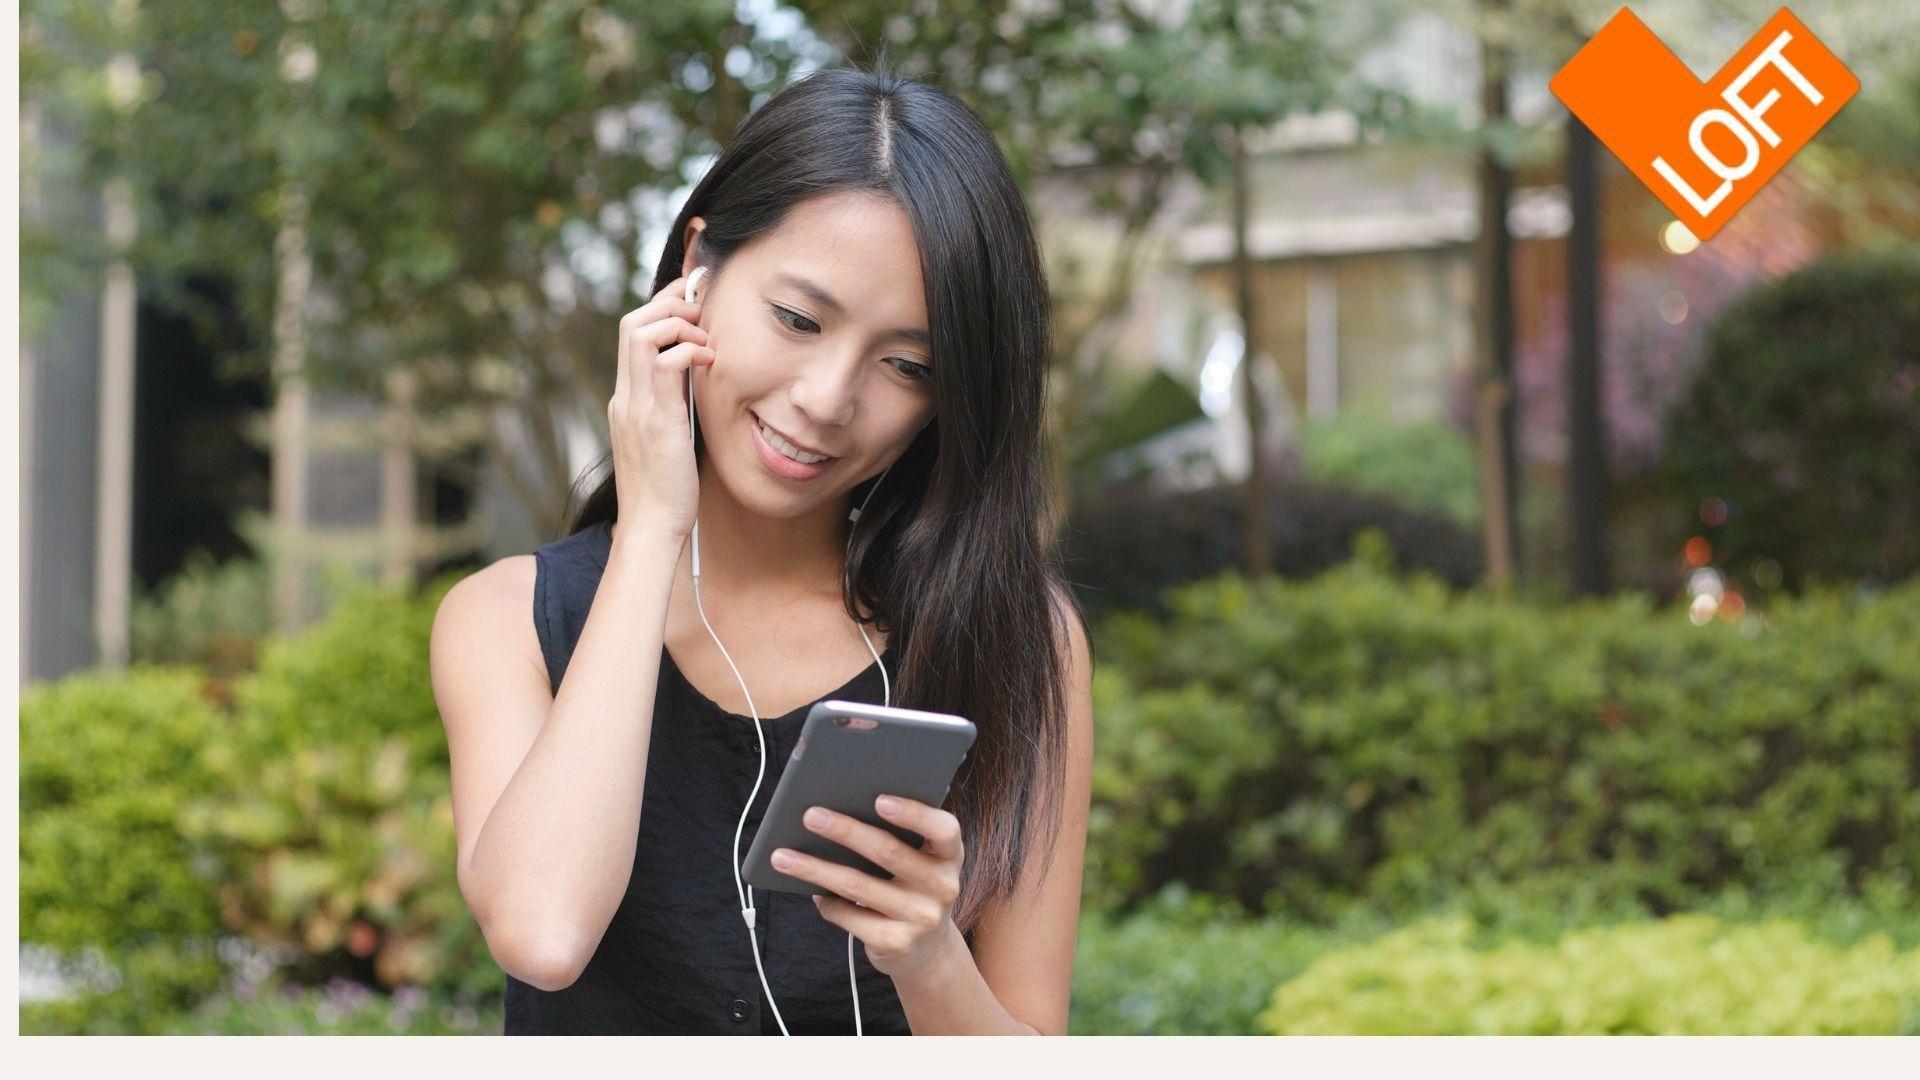 Como usar o Microfone no celular?